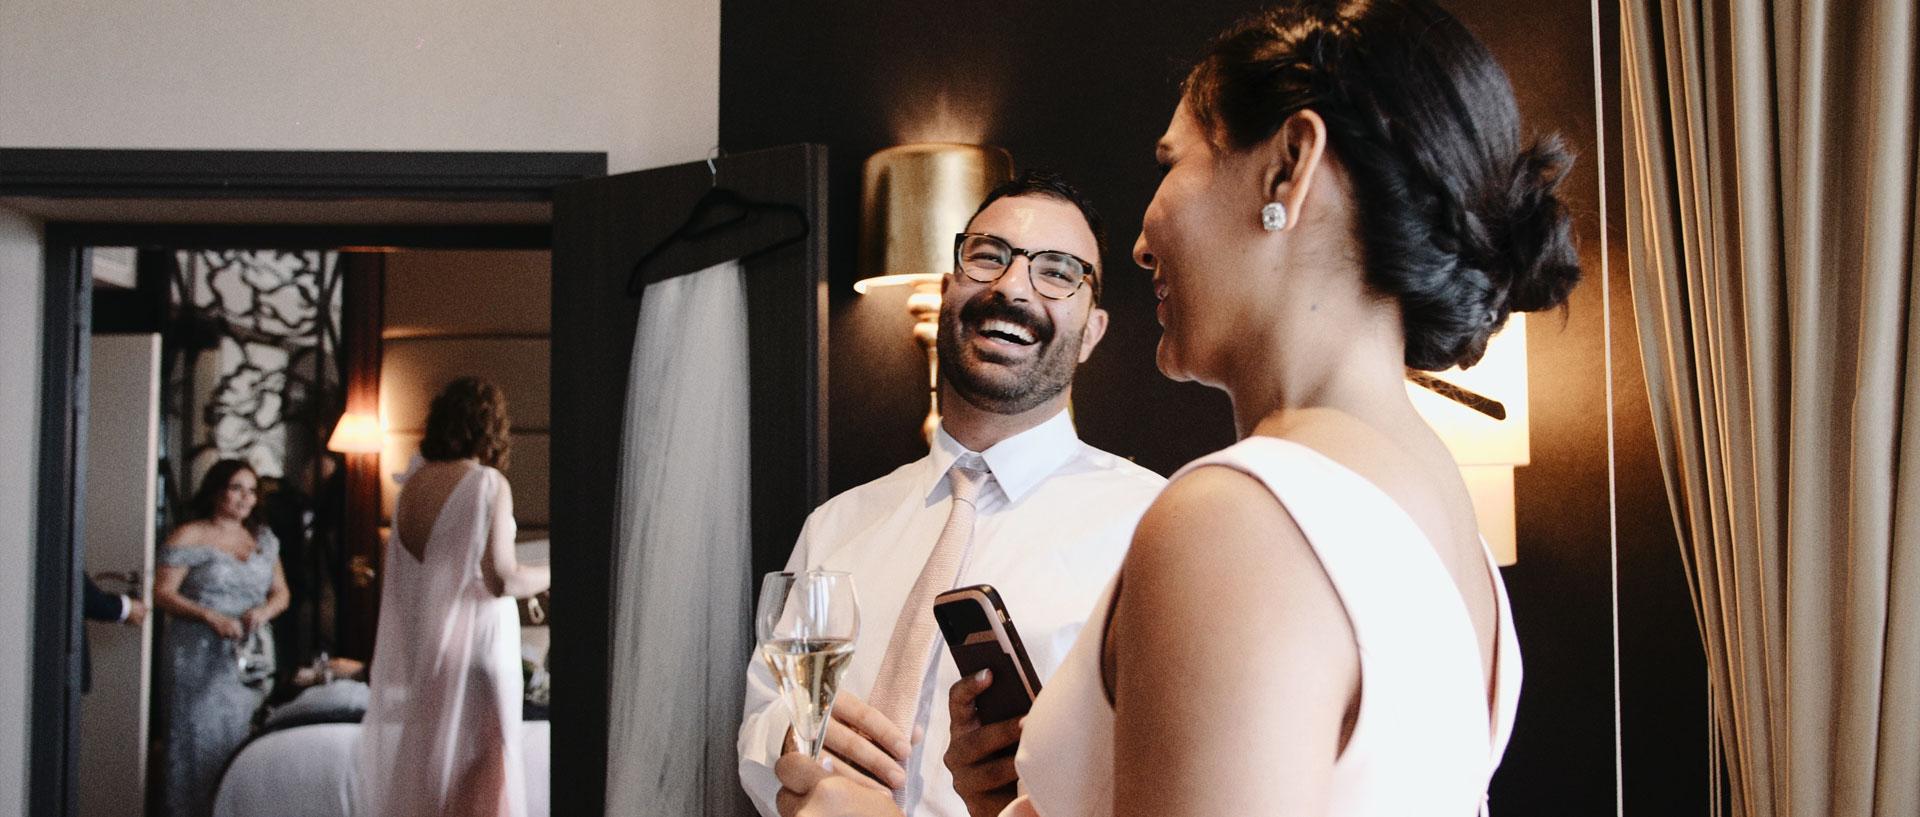 Natasha & Jad Wedding - Casino Biarritz (22).jpg